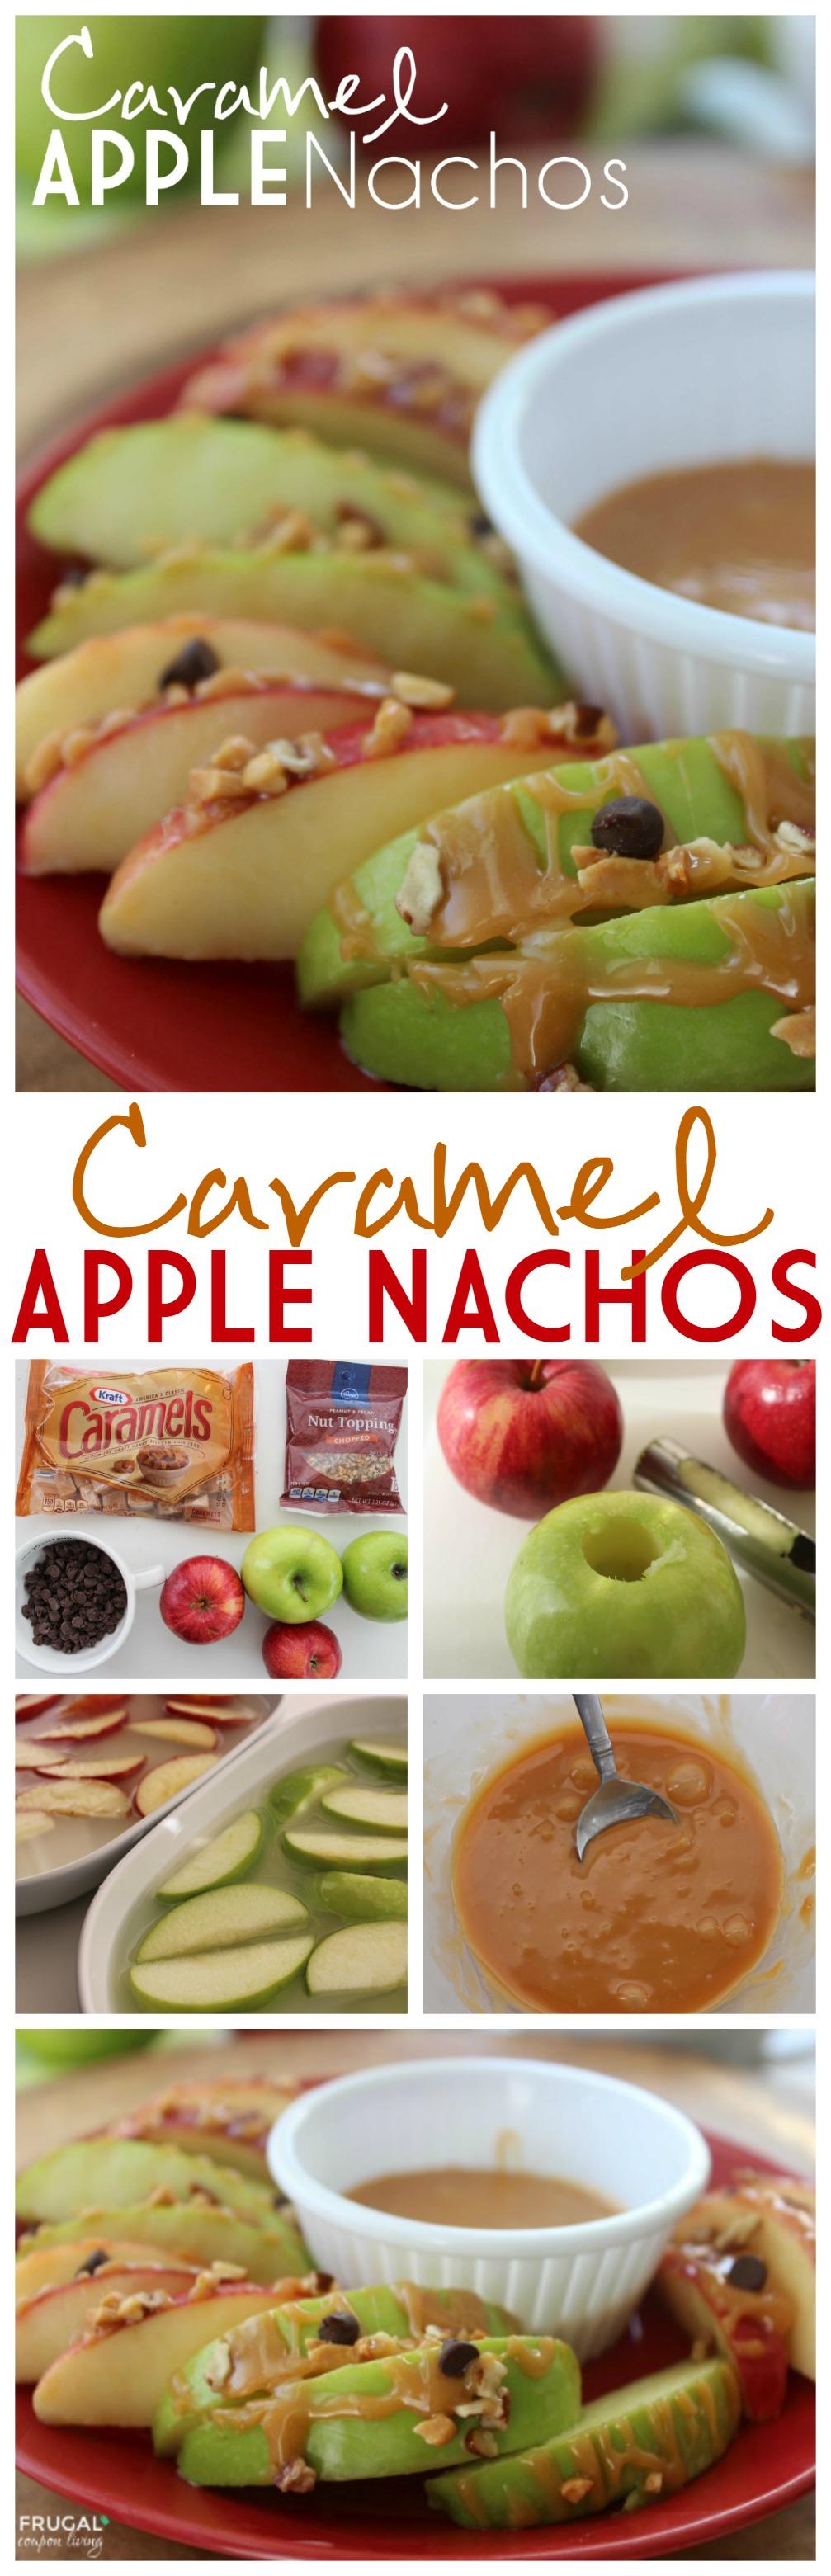 Caramel-apple-nachos-Collage-frugal-coupon-living